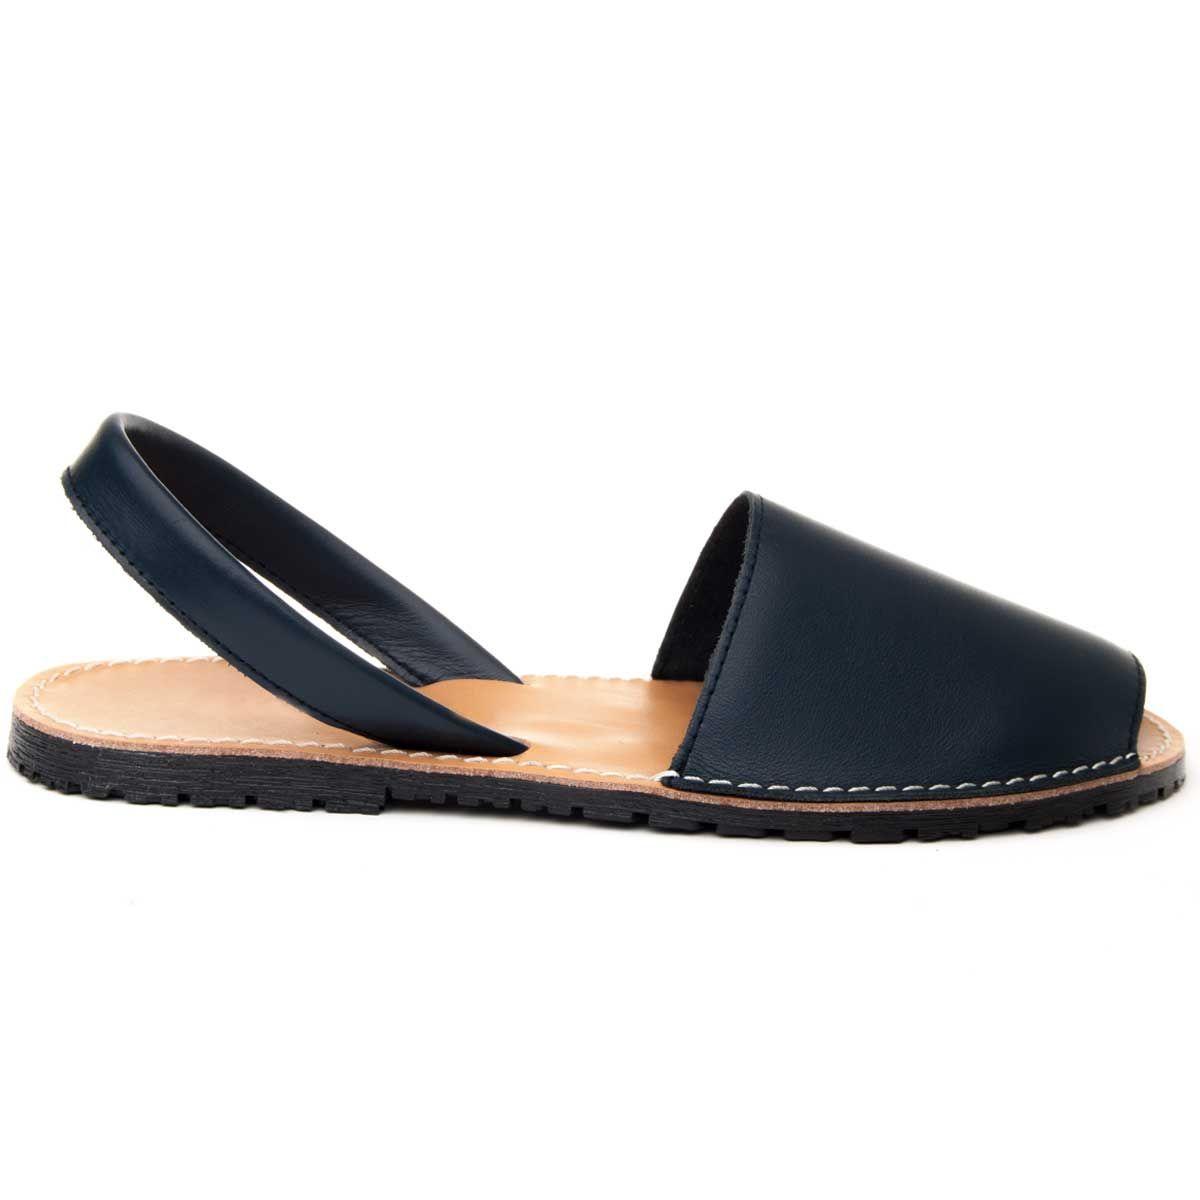 Purapiel Slingback Flat Sandal in Blue